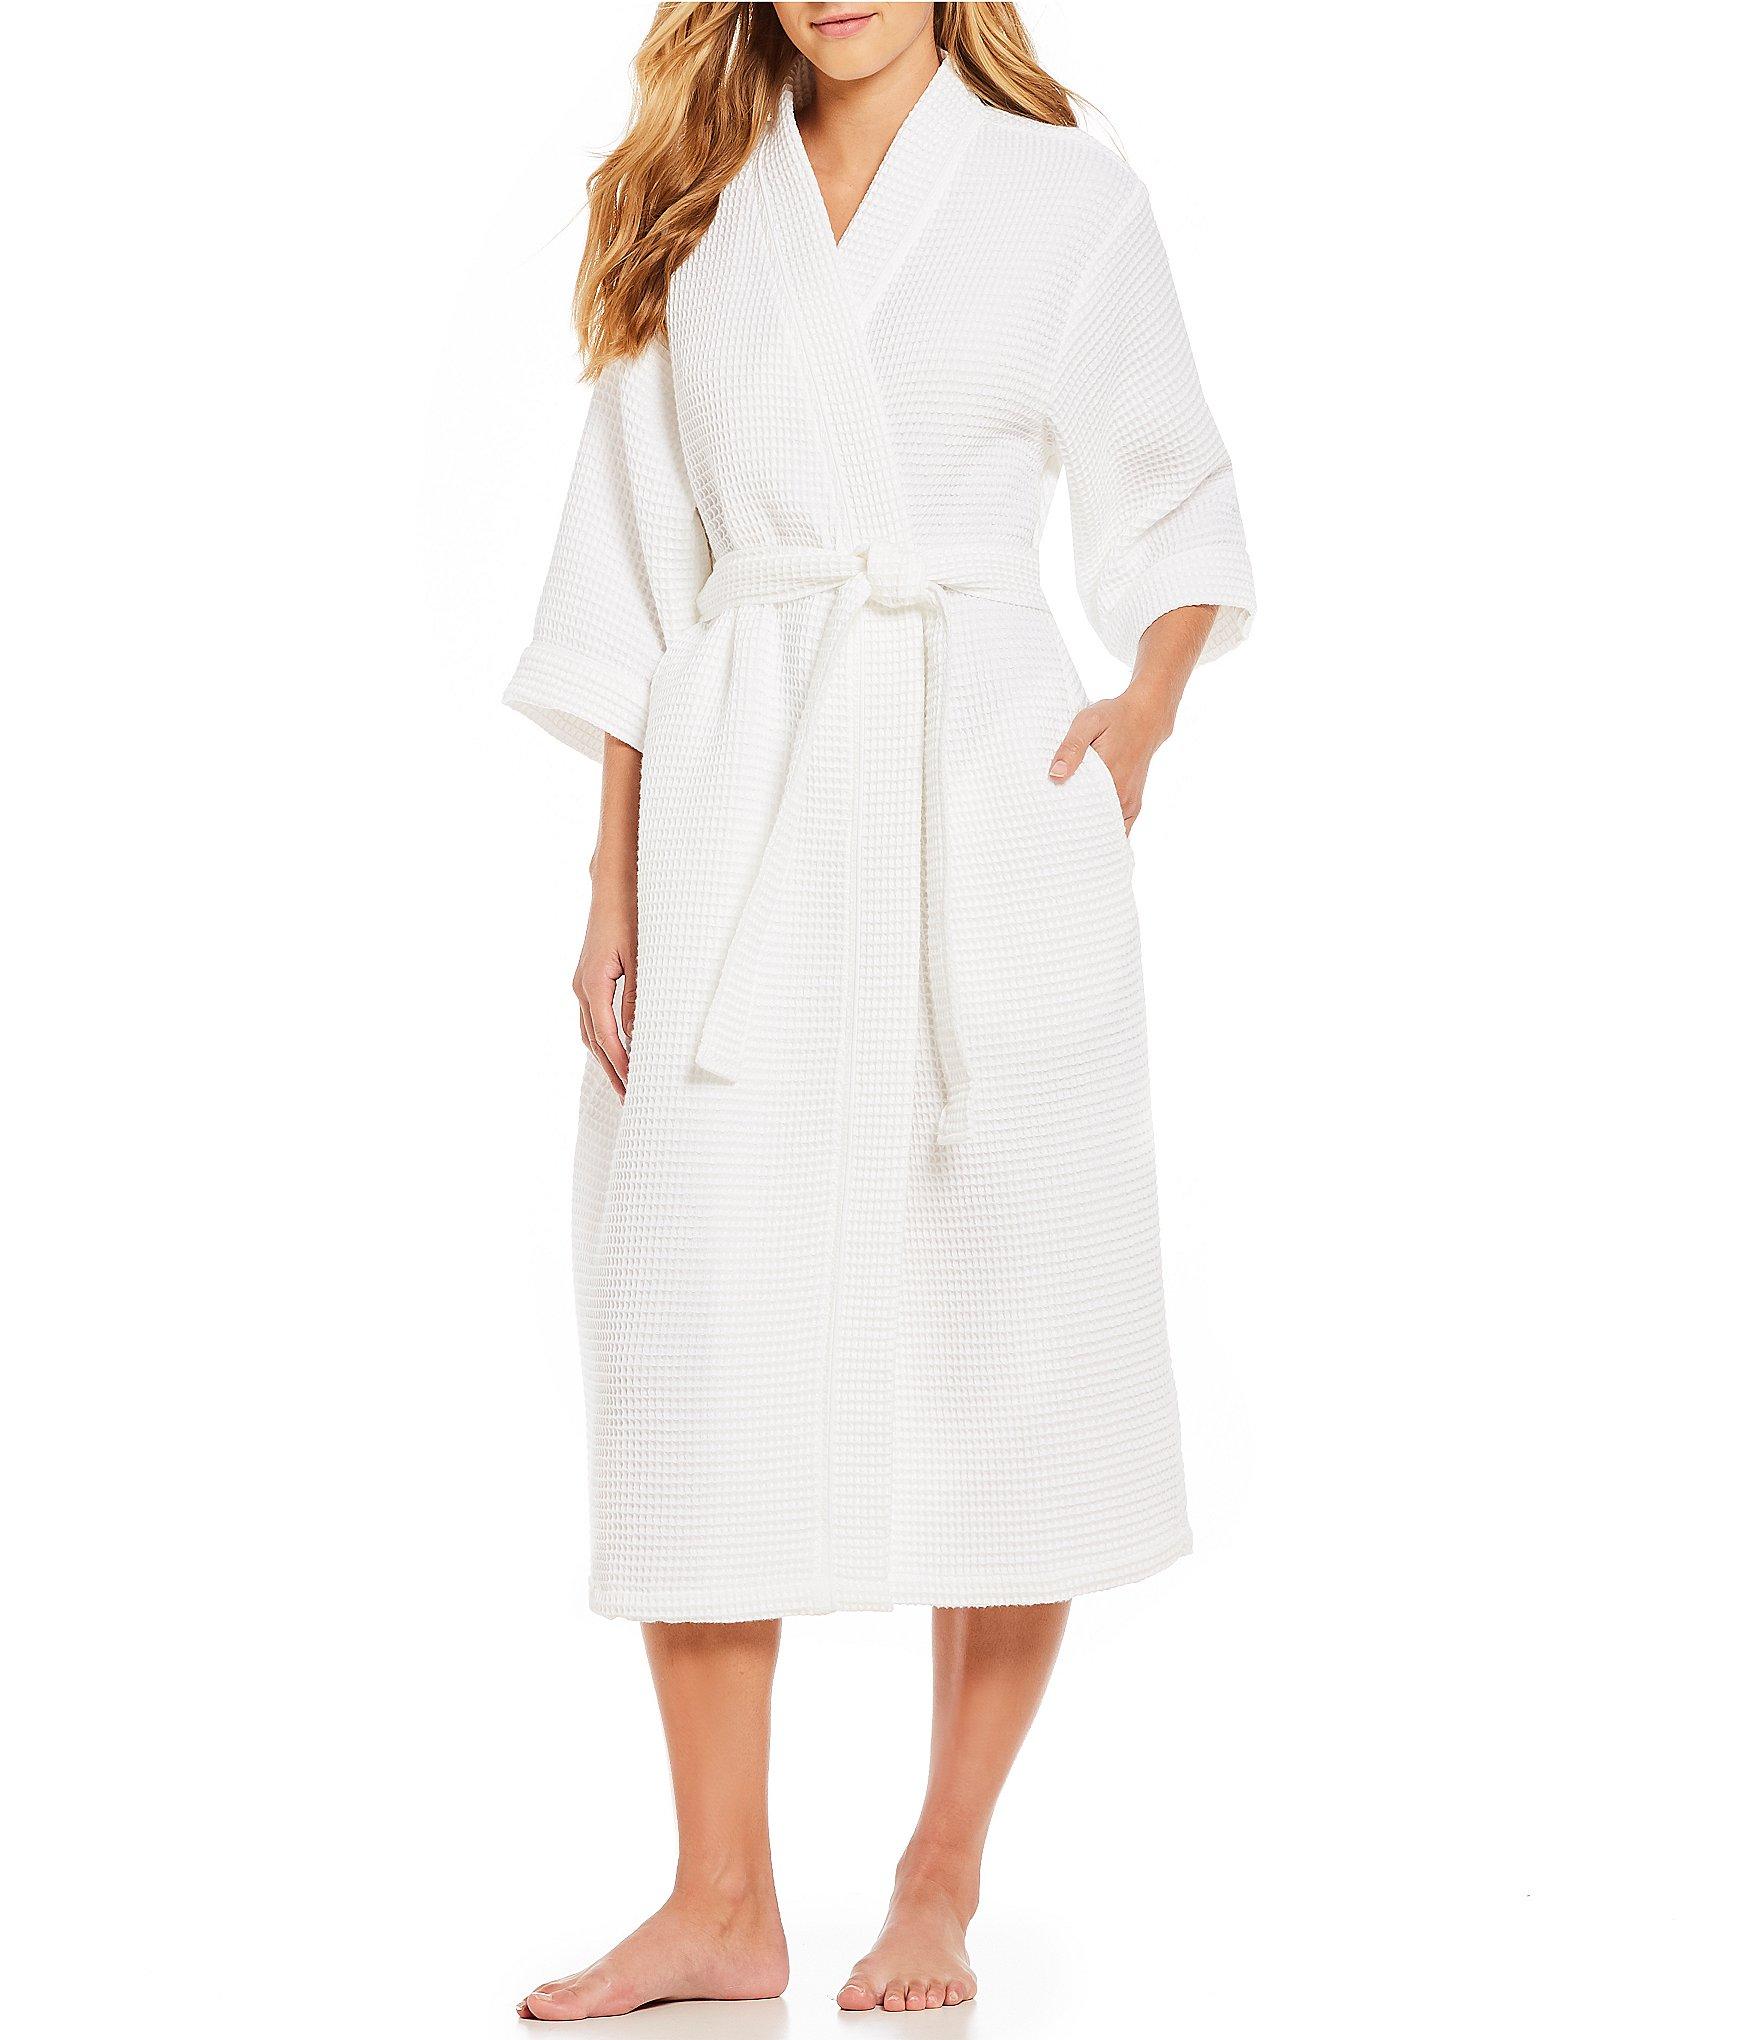 Essentials Womens Lightweight Waffle Mid-Length Robe